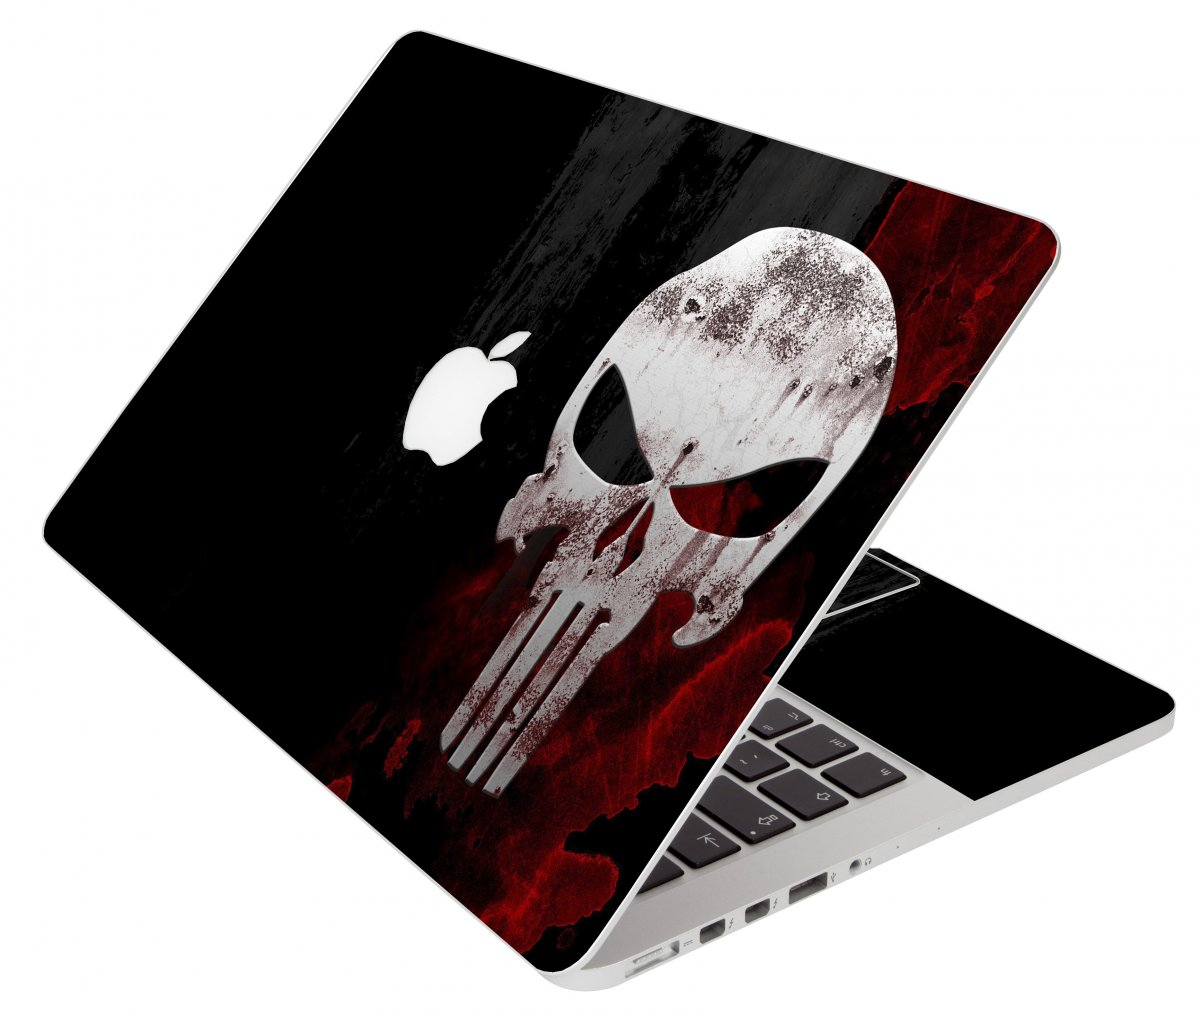 Punisher Skull Apple Macbook Pro 17 A1297 Laptop Skin